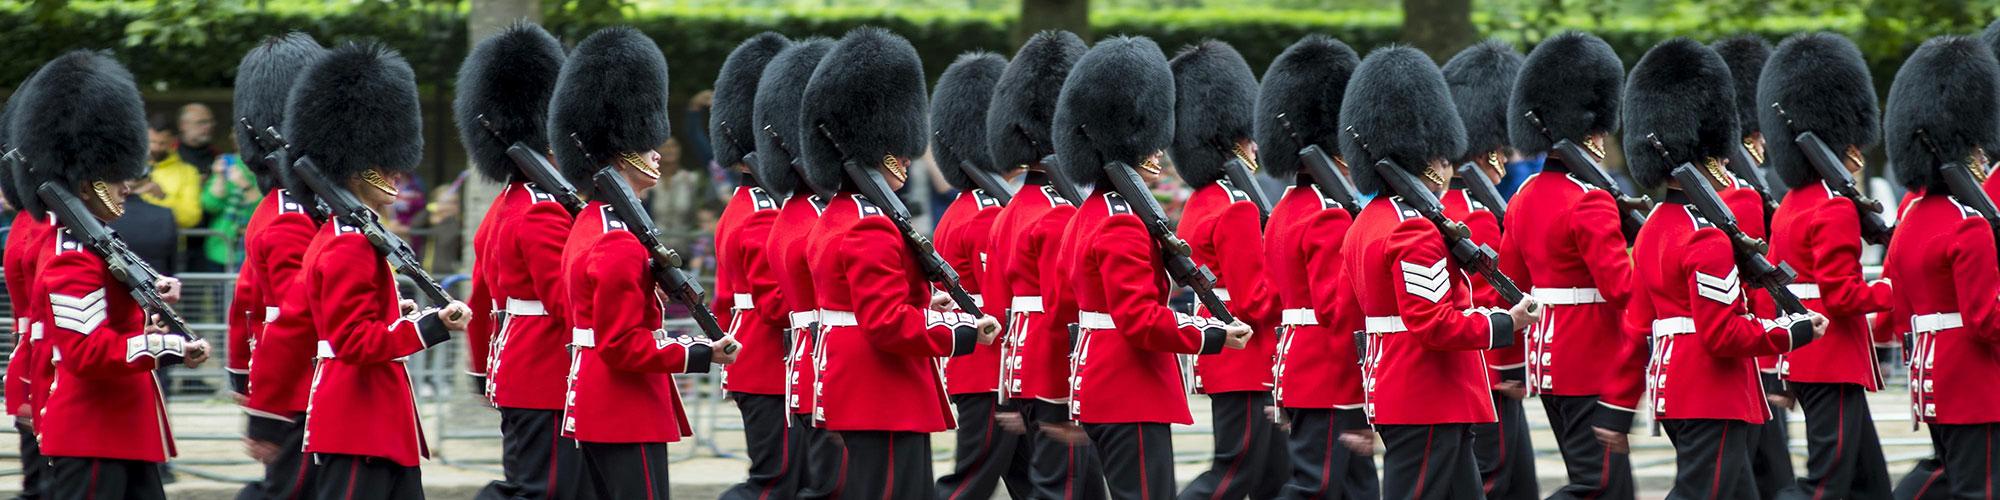 English Queens British Guards Uniform Marching London